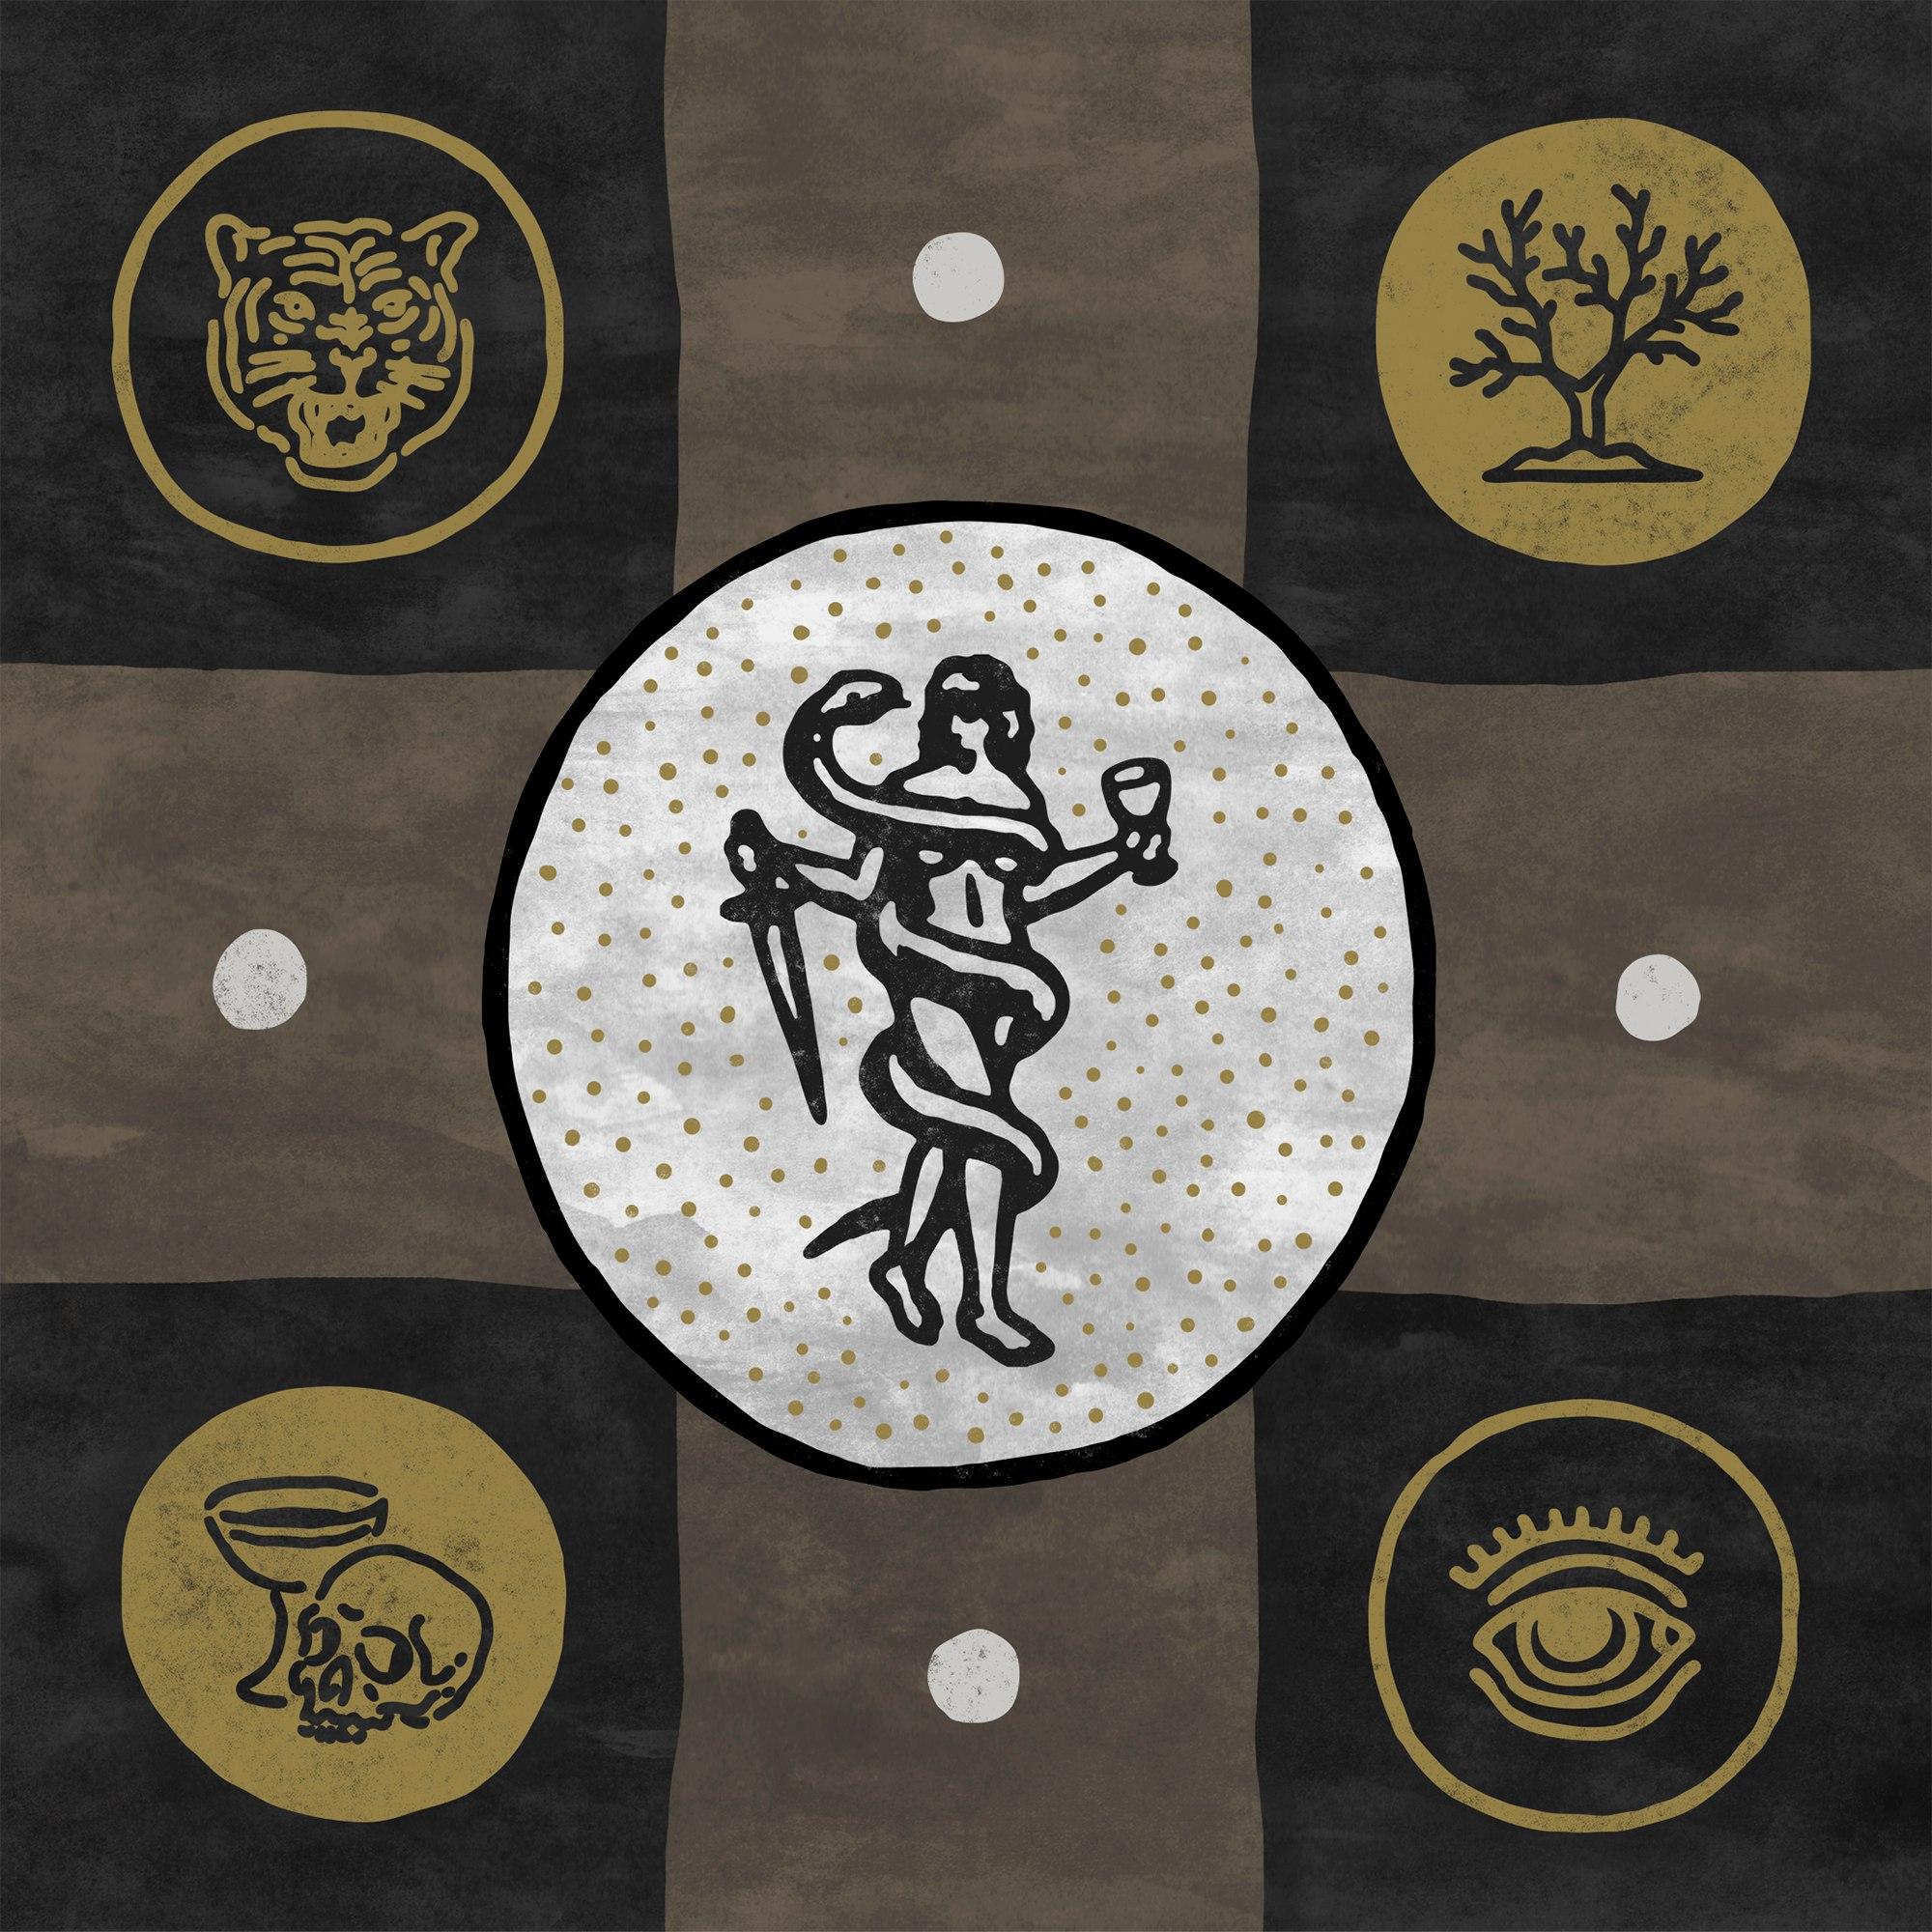 Новый альбом The Jack Wood - Ritual